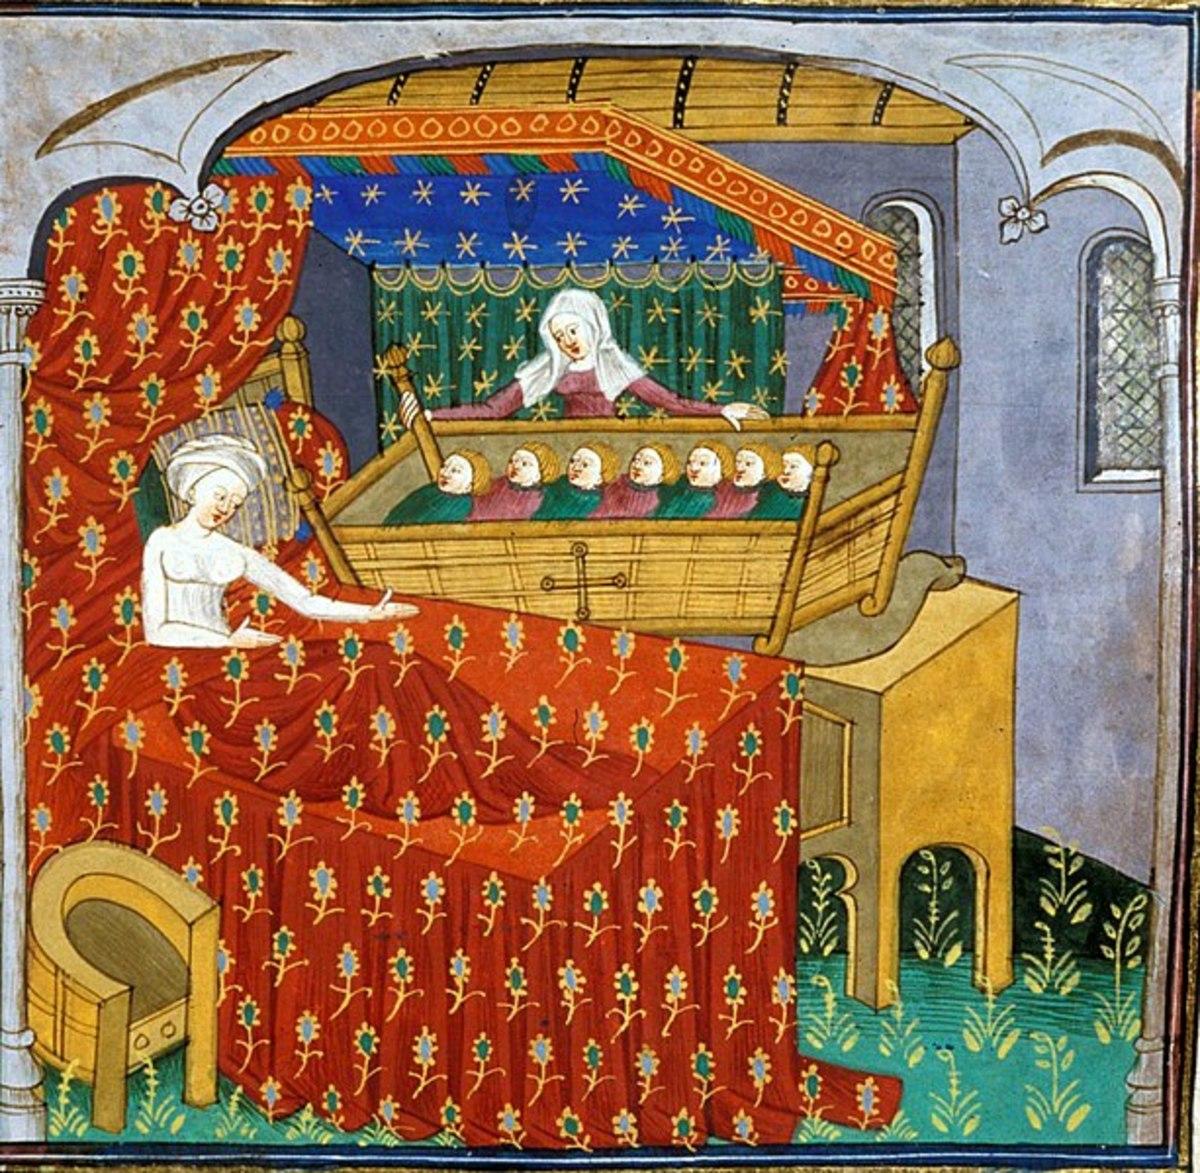 Medieval Royal Babies of England